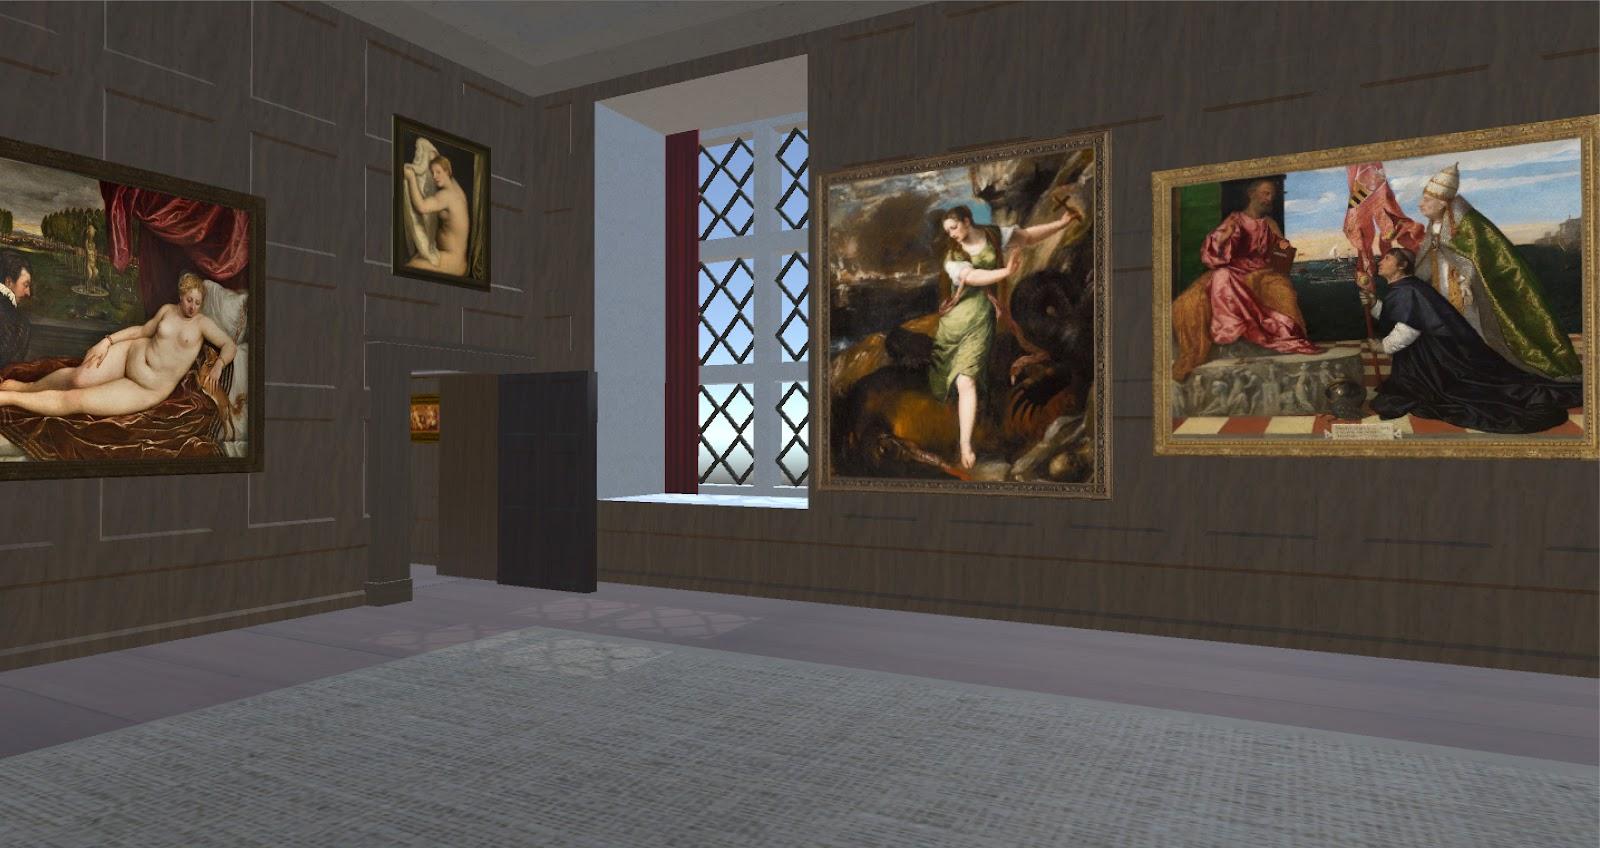 A 3D model depicting a Tudor / Stuart era interior filled with Renaissance paintings